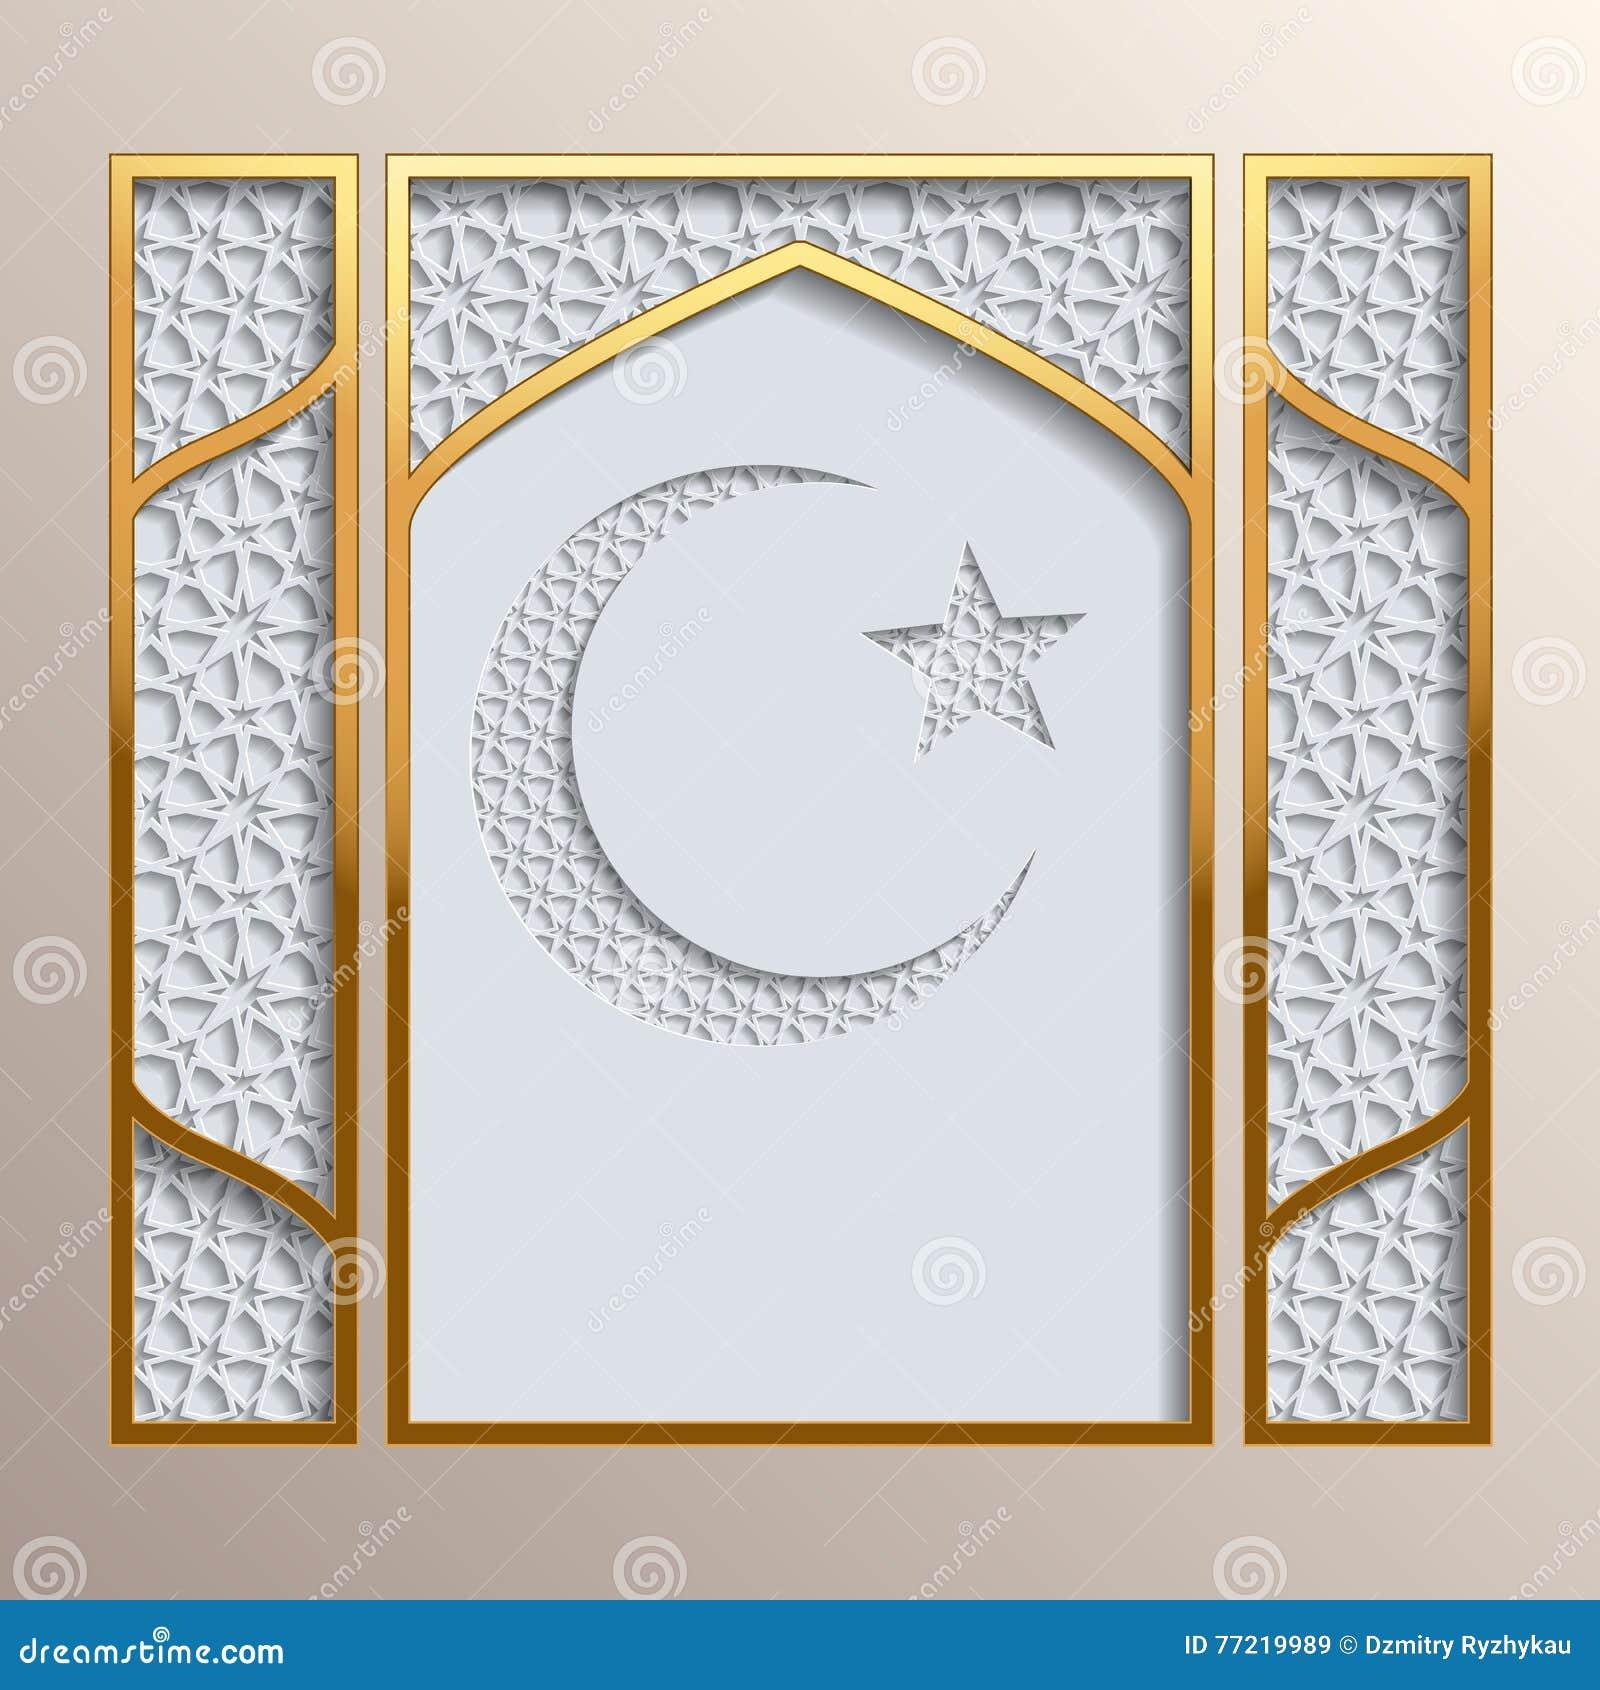 Islamic greeting card template stock illustration illustration of islamic greeting card template m4hsunfo